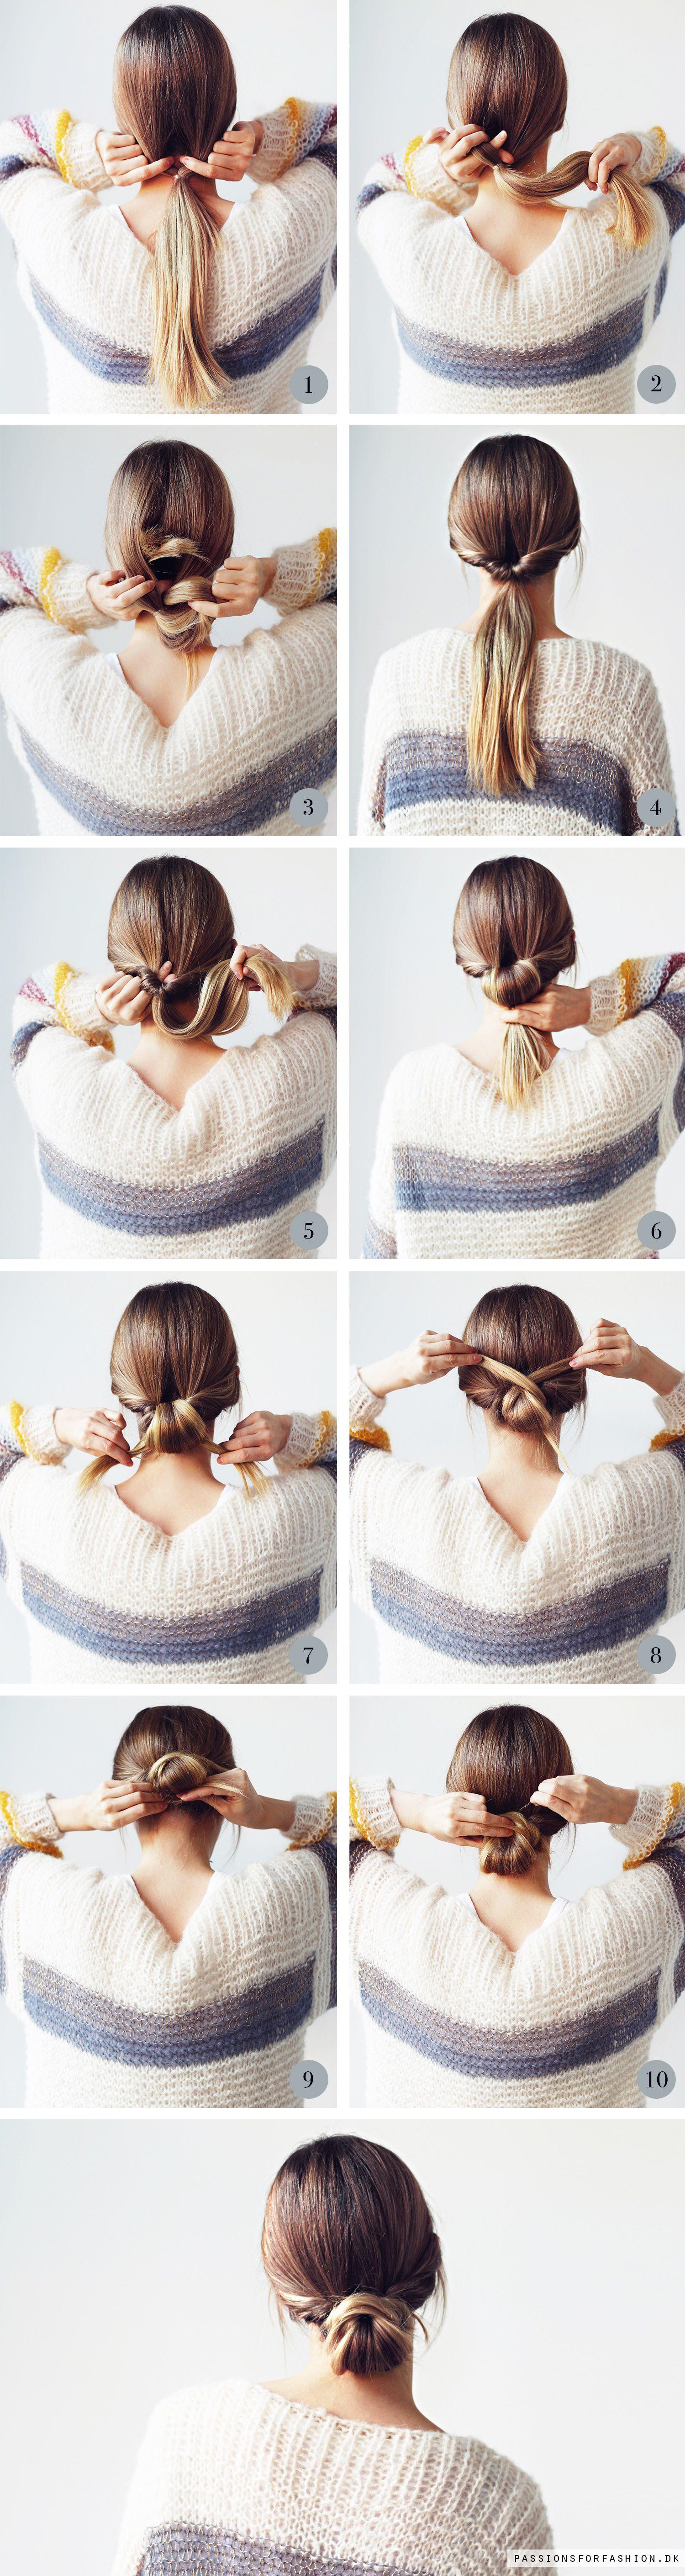 Step By Step Messy Bun Long Hair Styles Hair Tutorial Full Hair